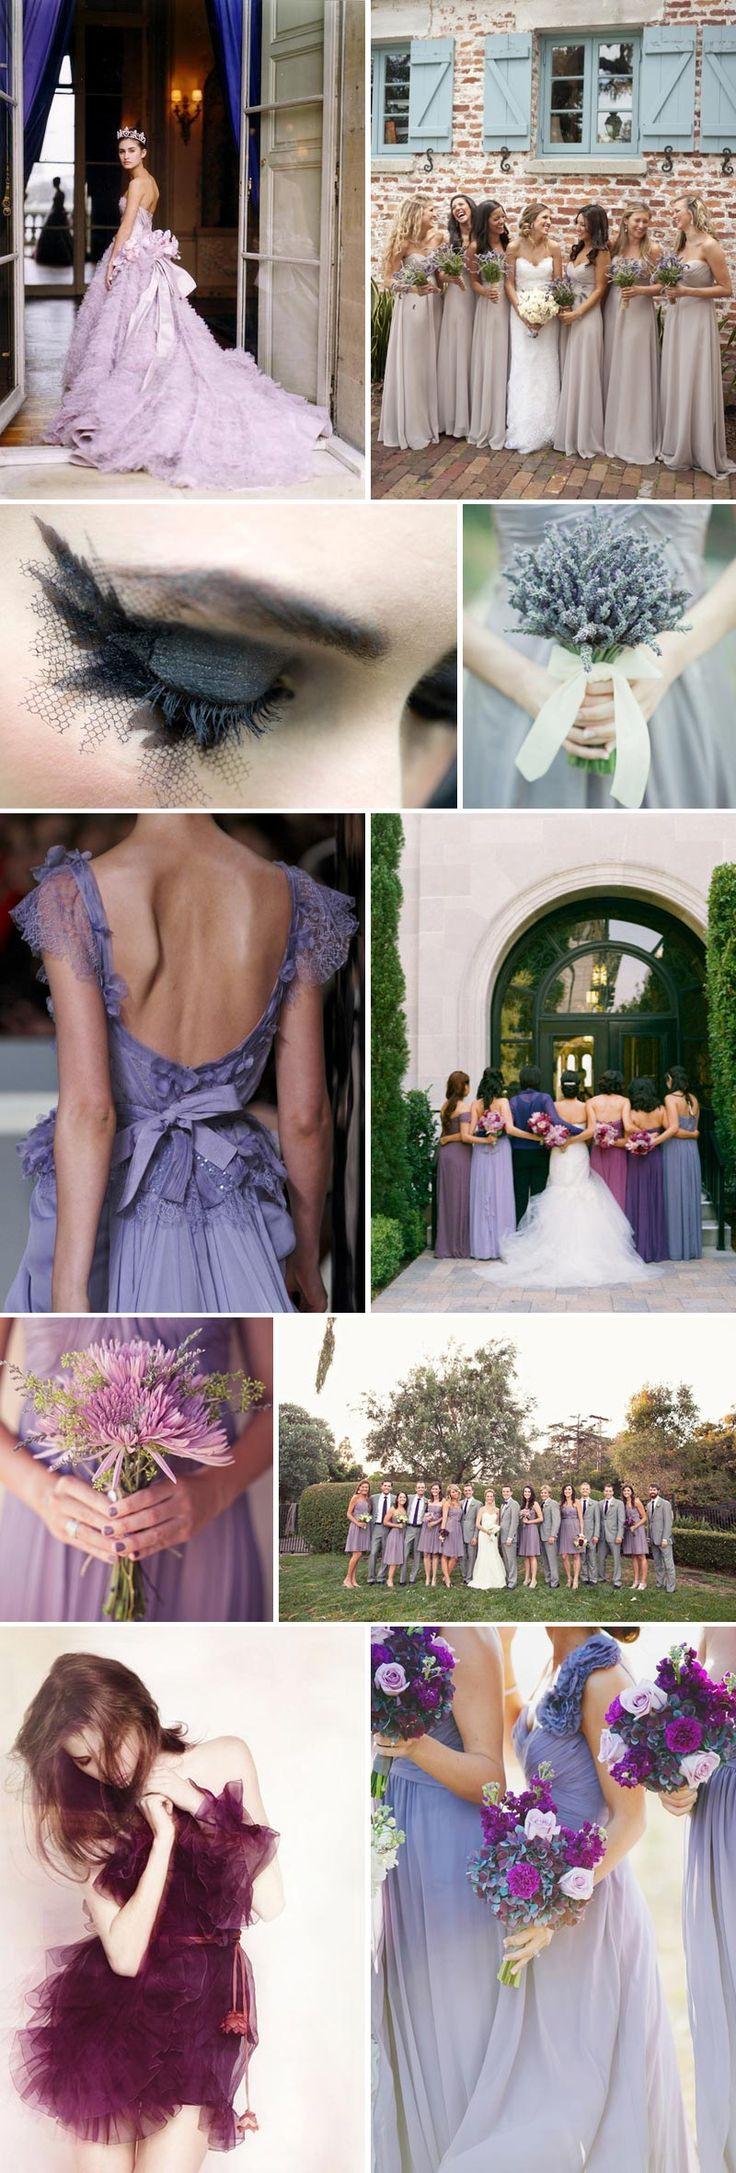 I like the mauve bridesmaids dresses http://www.rockmywedding.co.uk/page/5/